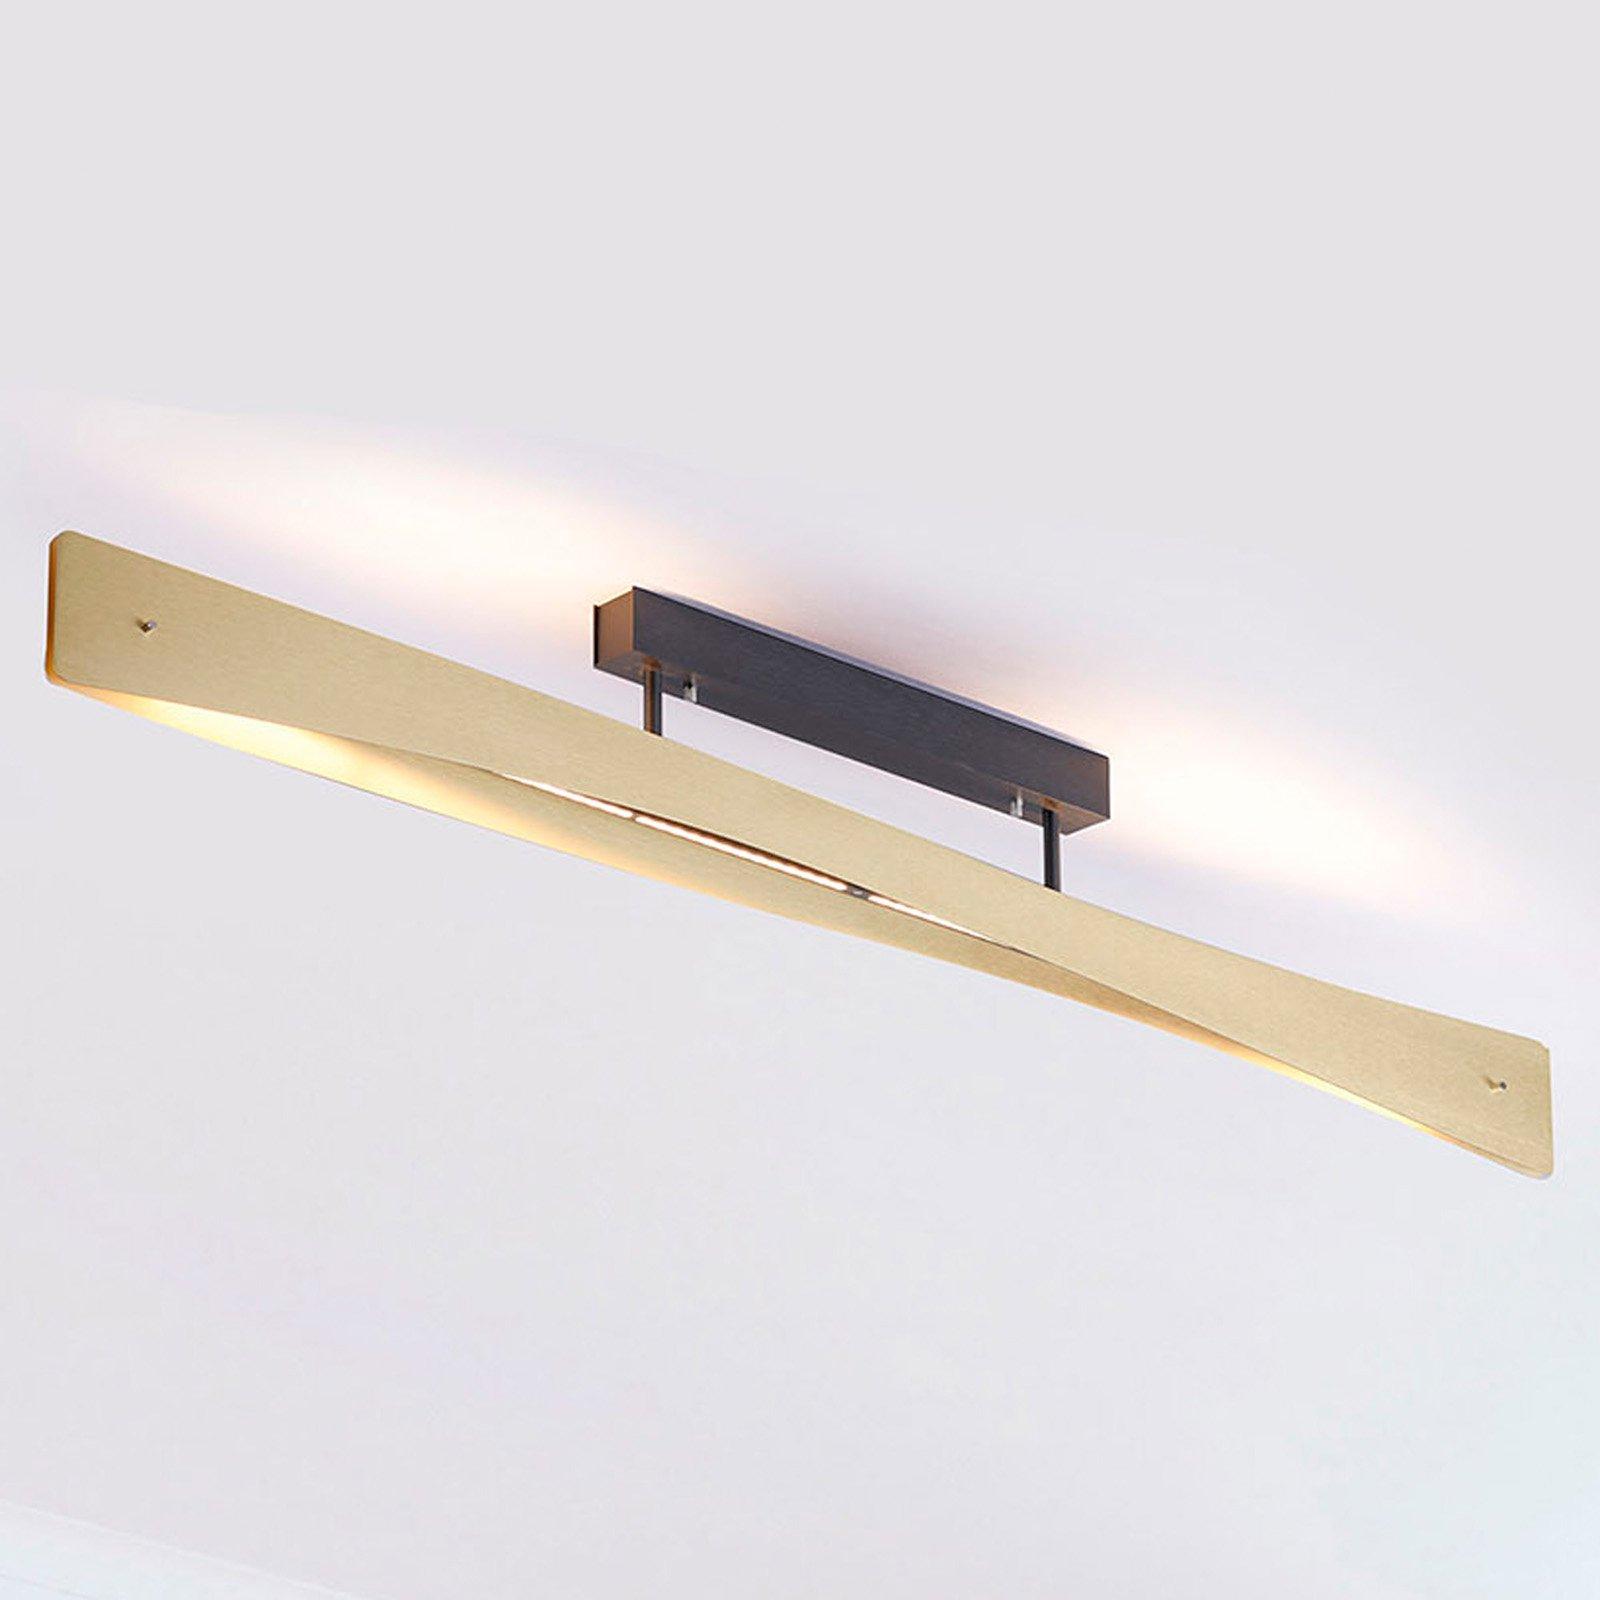 Lucande Lian LED-taklampe, messing, svart